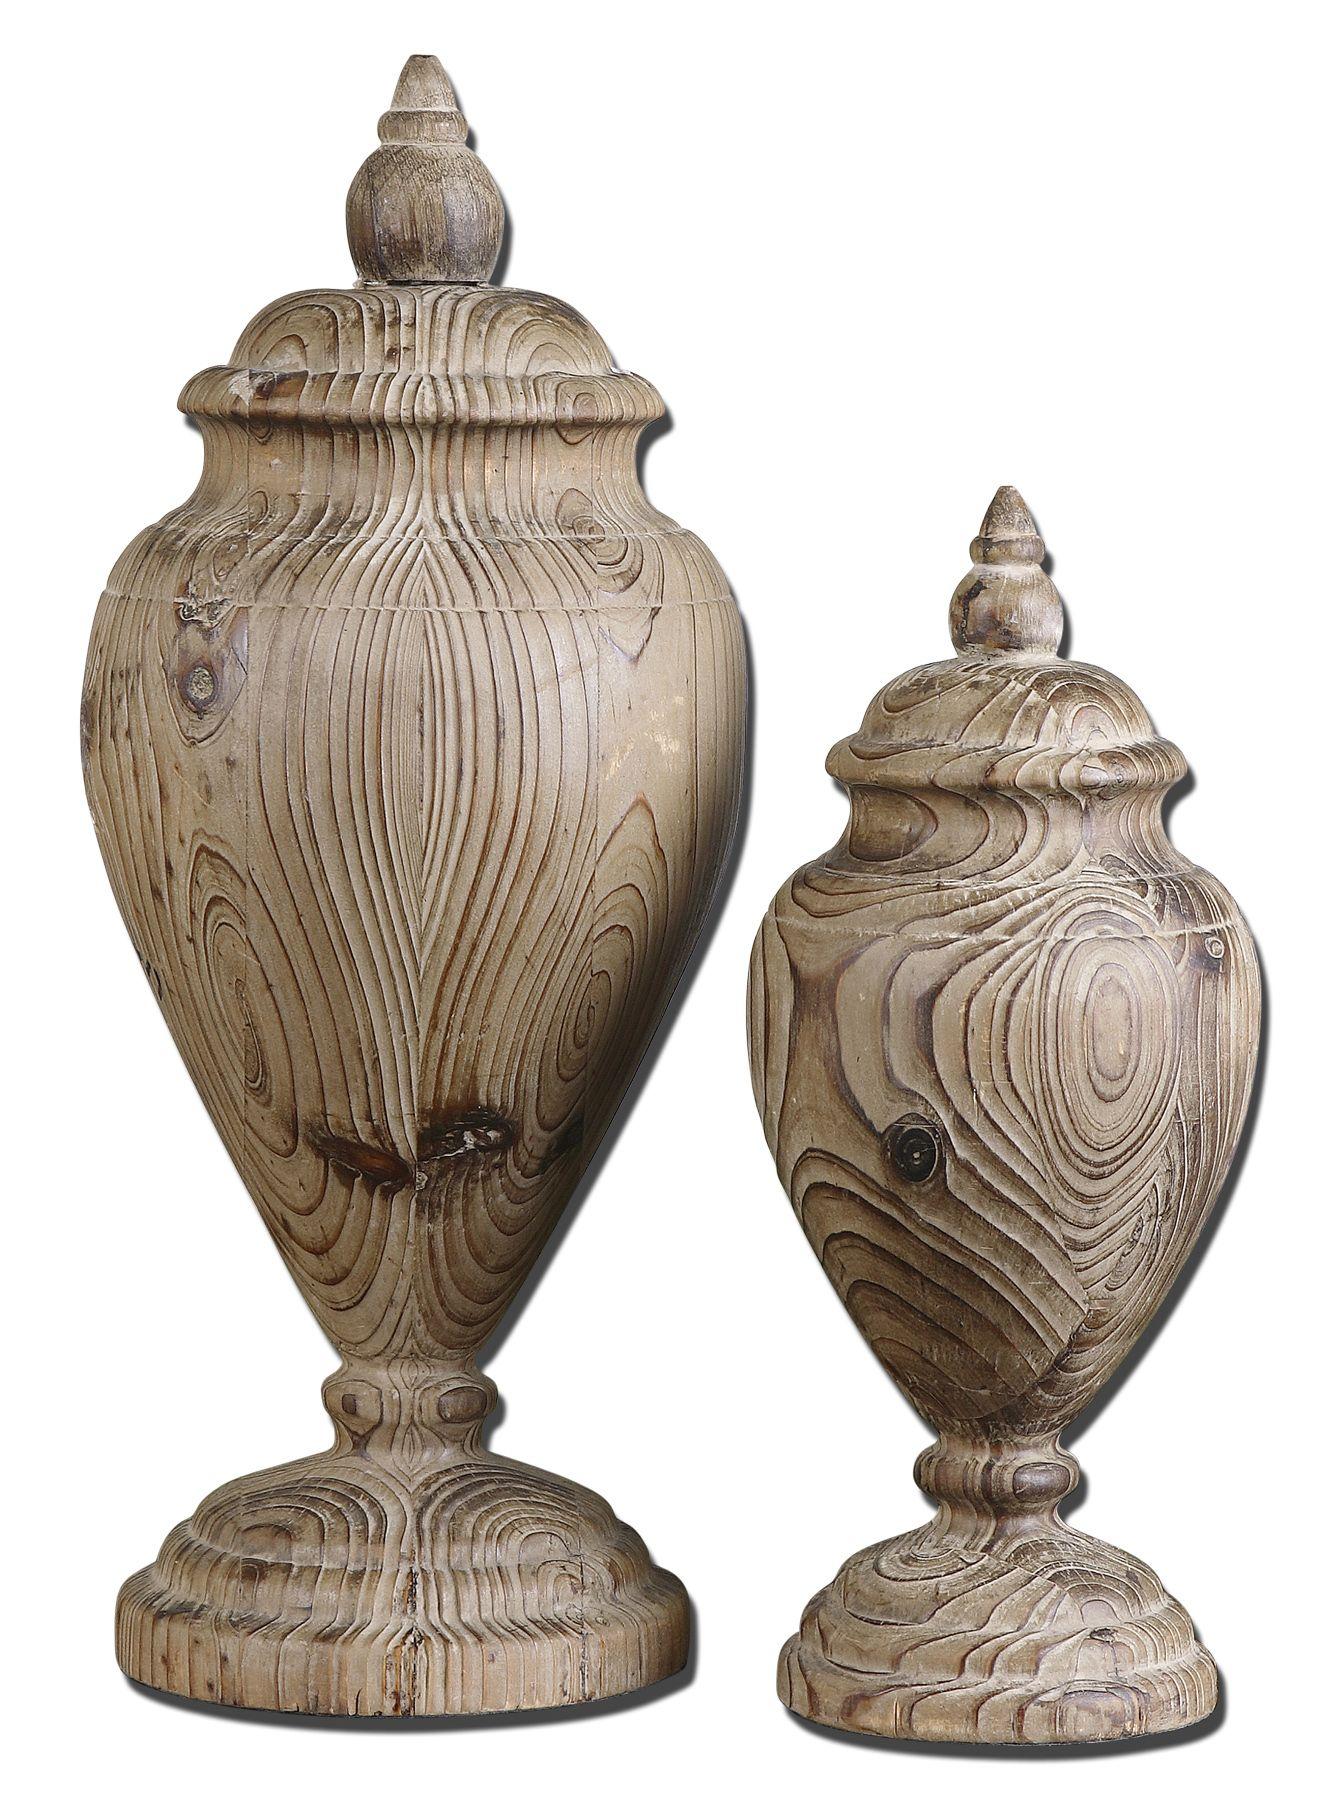 Uttermost 19613 Brisco Carved Wood Finials Set/2